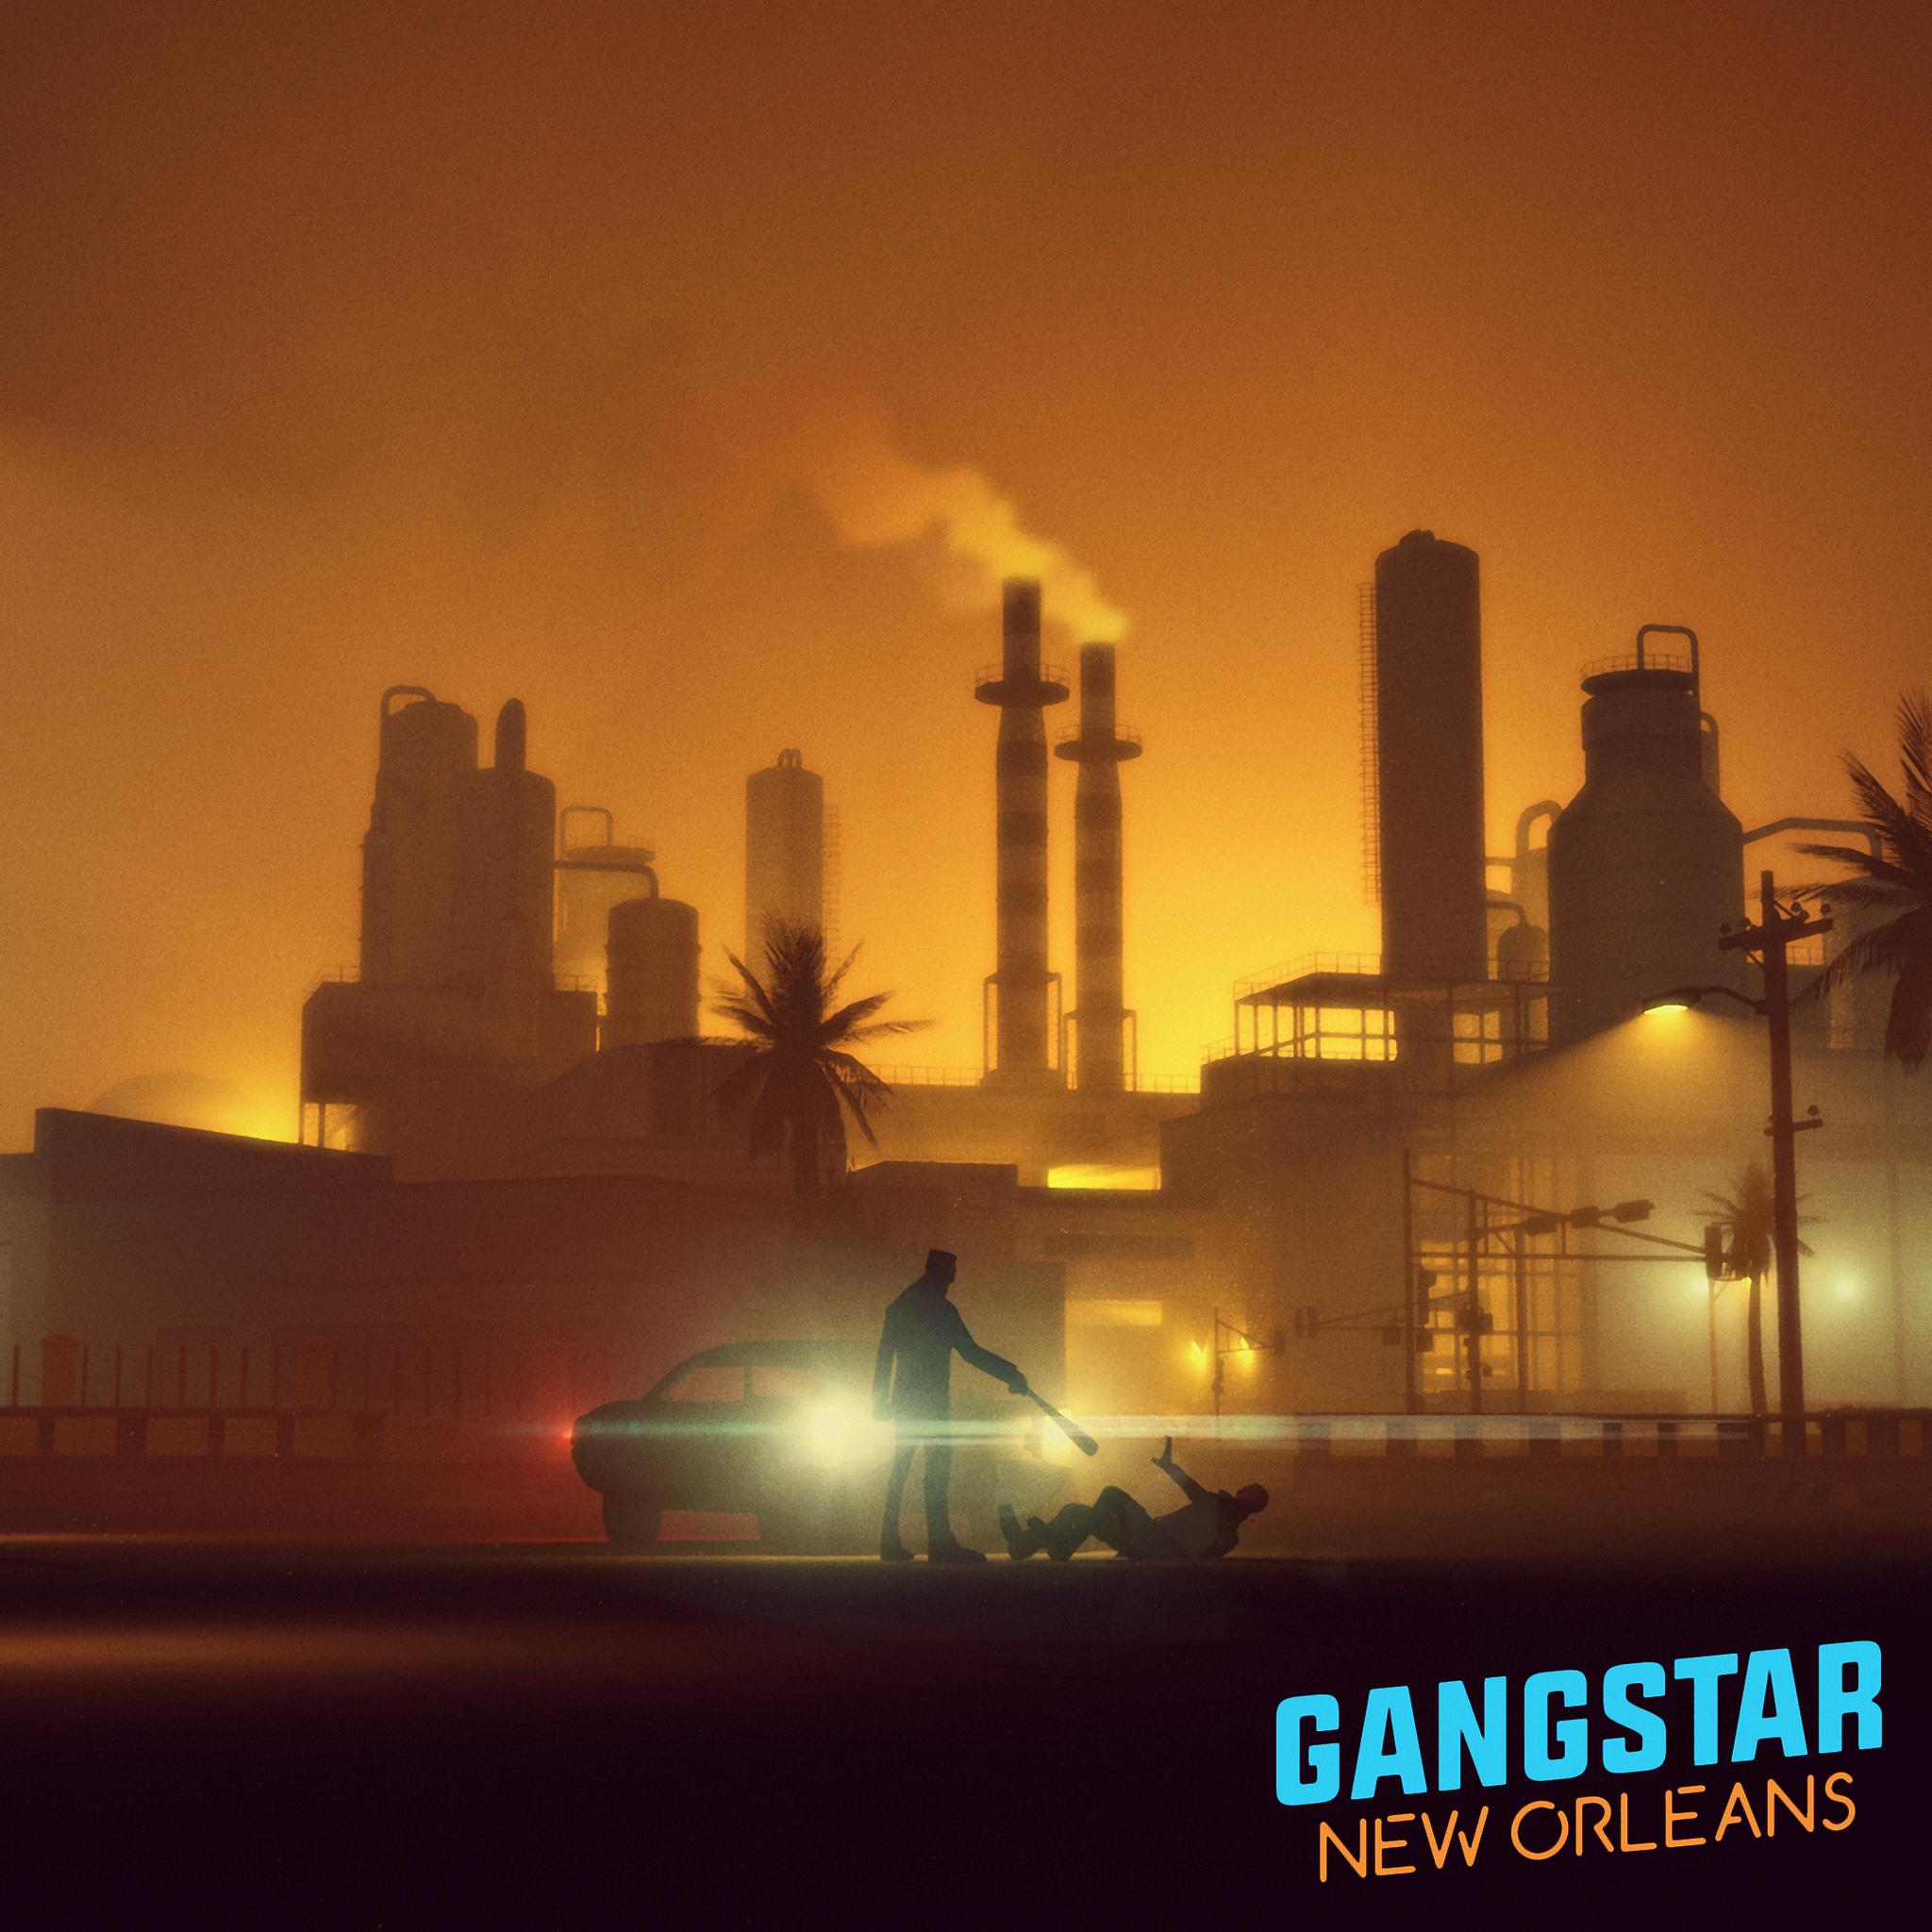 Wallpaper 2 Gangstar New Orleans